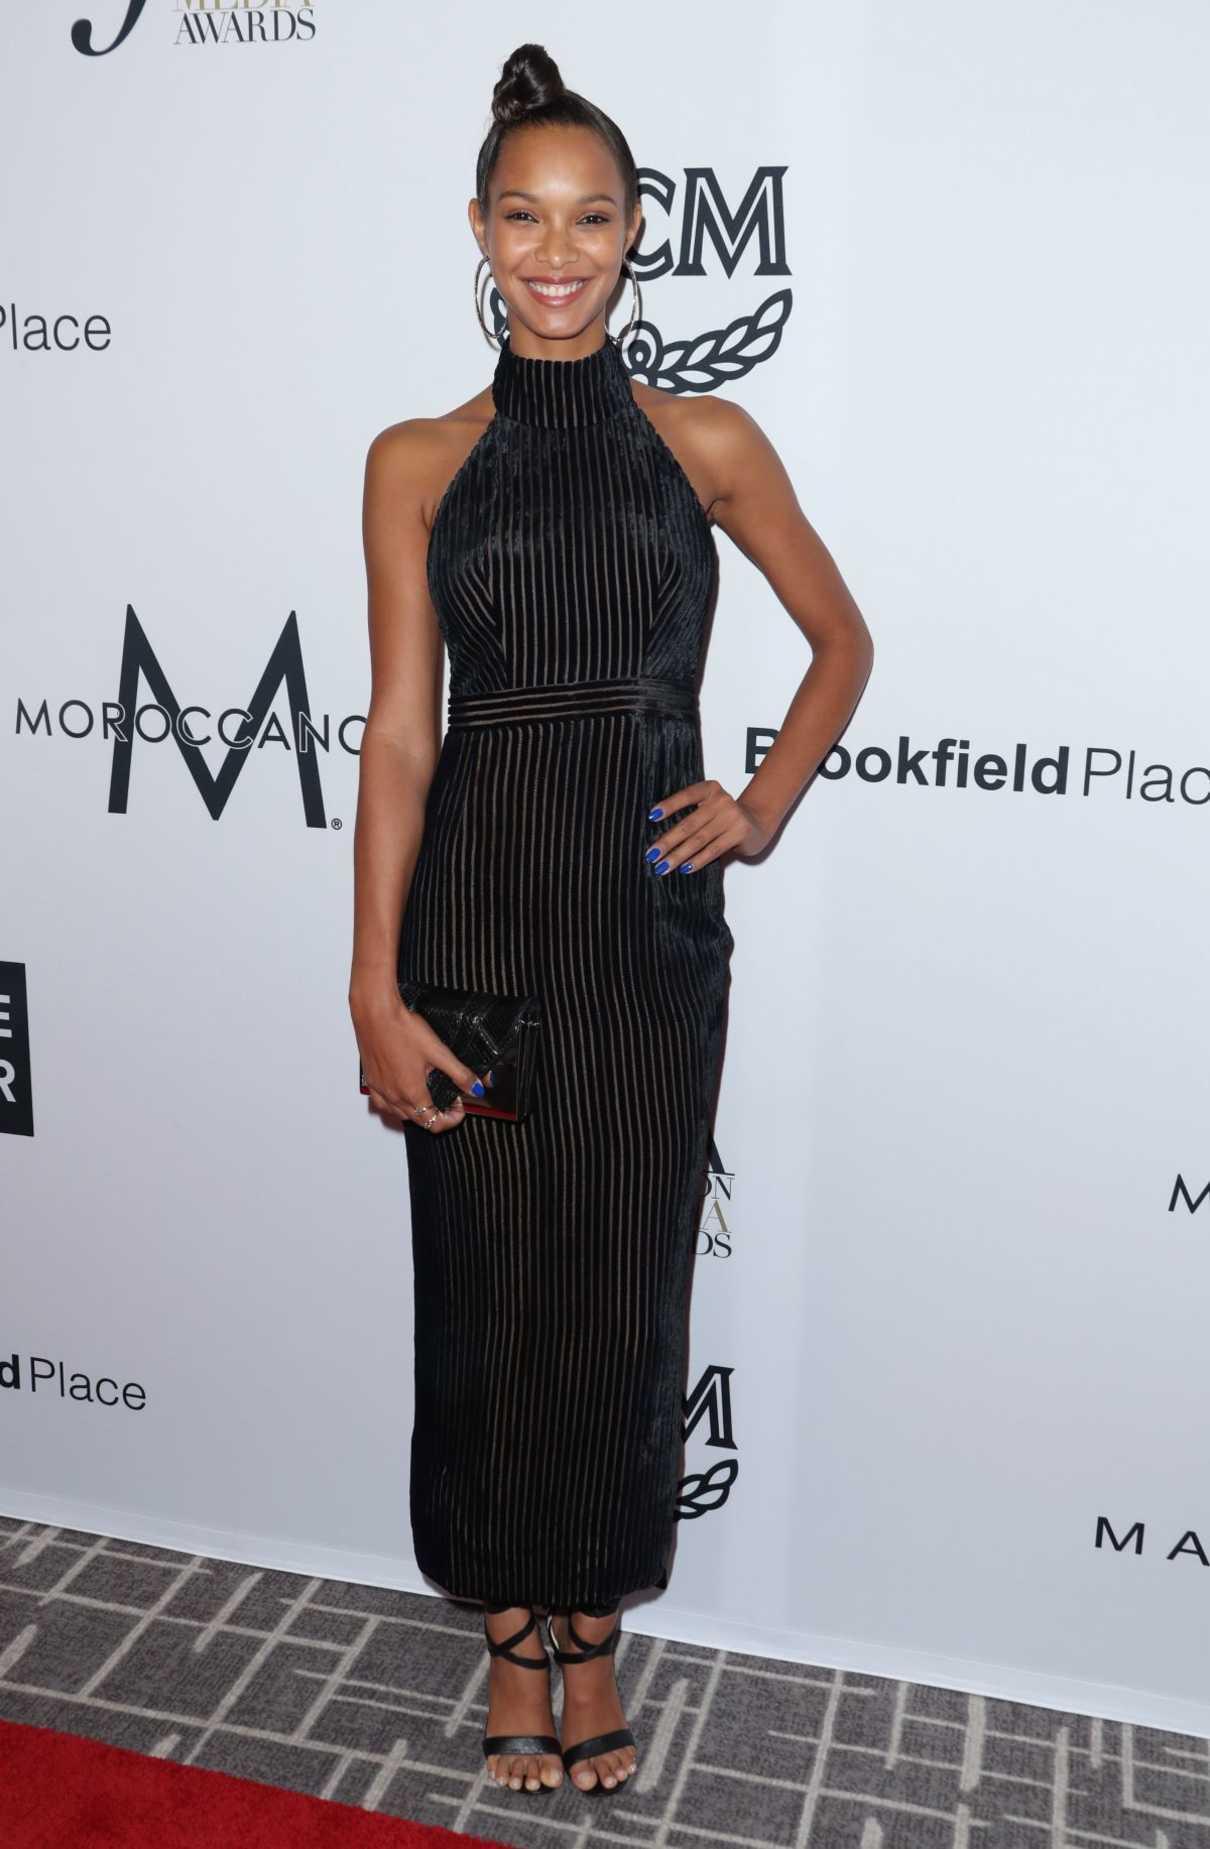 Lais Ribeiro At Daily Front Row Fashion Awards During New York Fashion Week 09 08 2017 Lacelebs Co